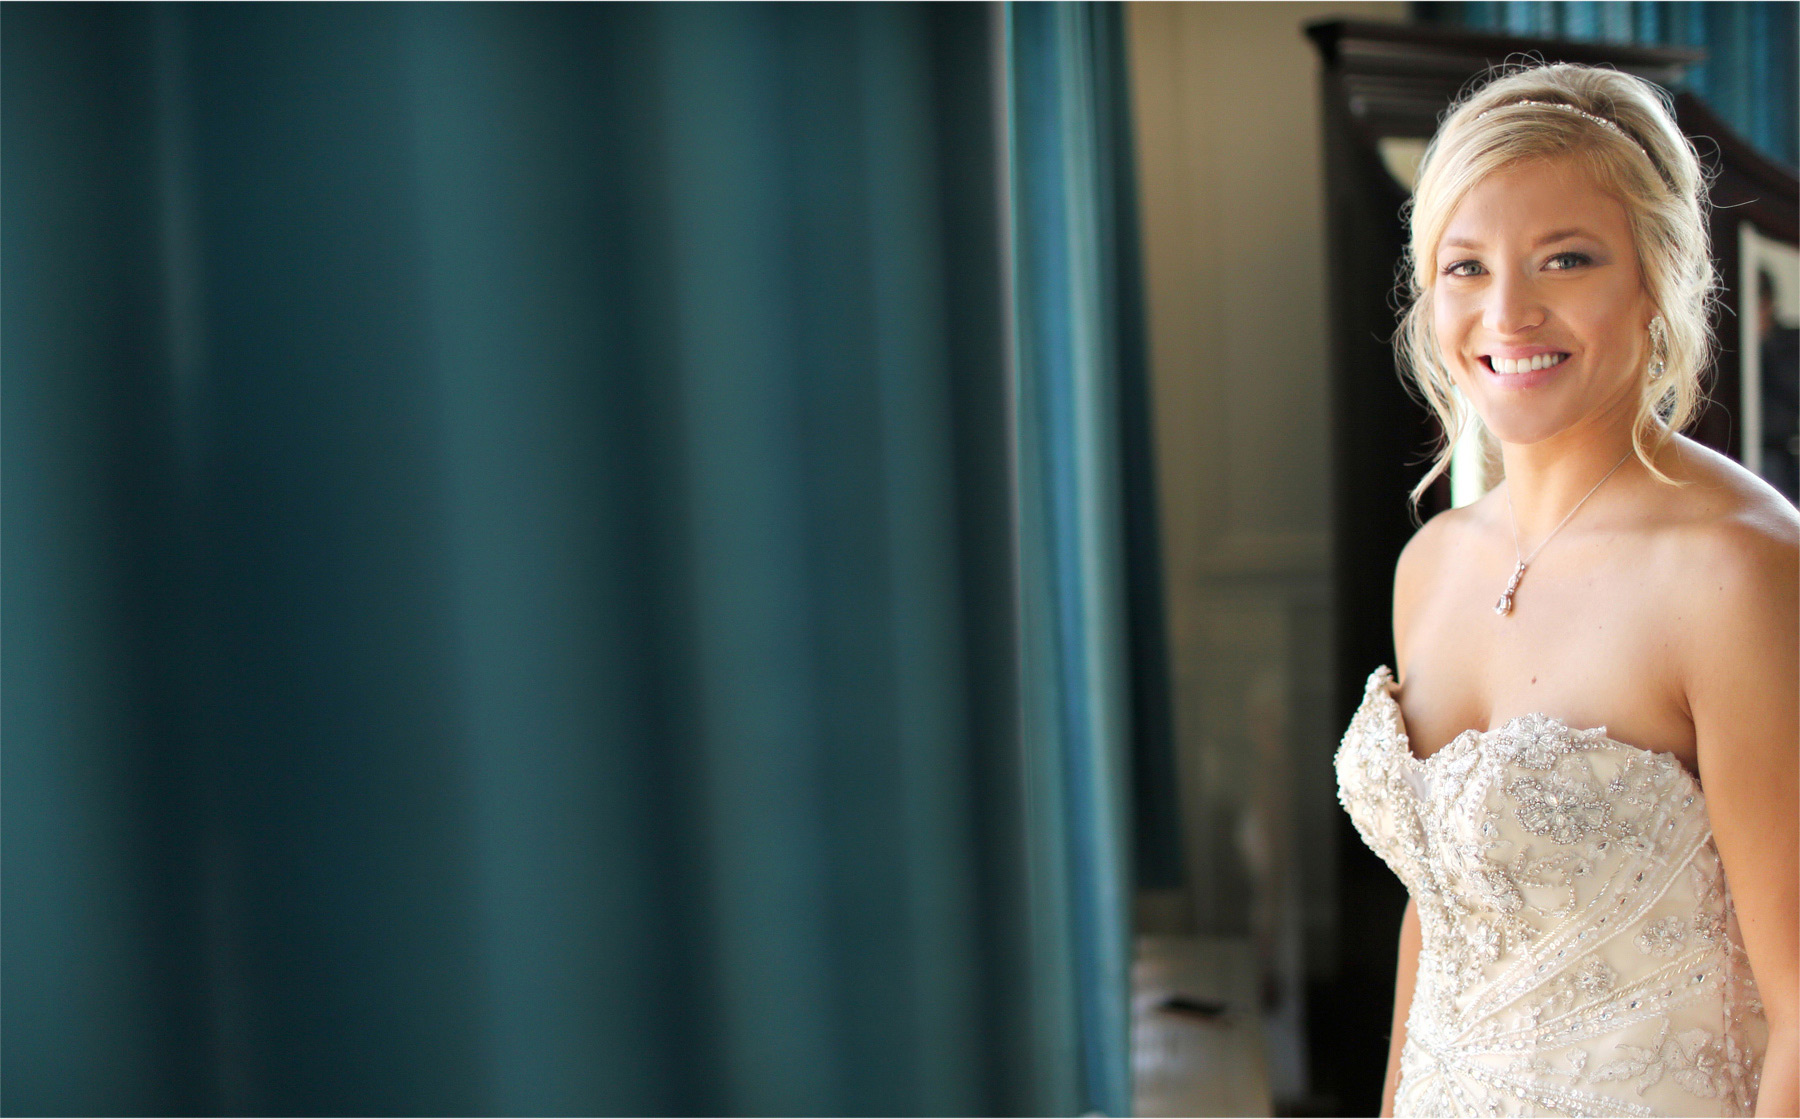 04-Duluth-Minnesota-Wedding-Photographer-by-Andrew-Vick-Photography-Summer-Greysolon-Ballroom-Getting-Ready-Bride-Lindsey-and-Adam.jpg